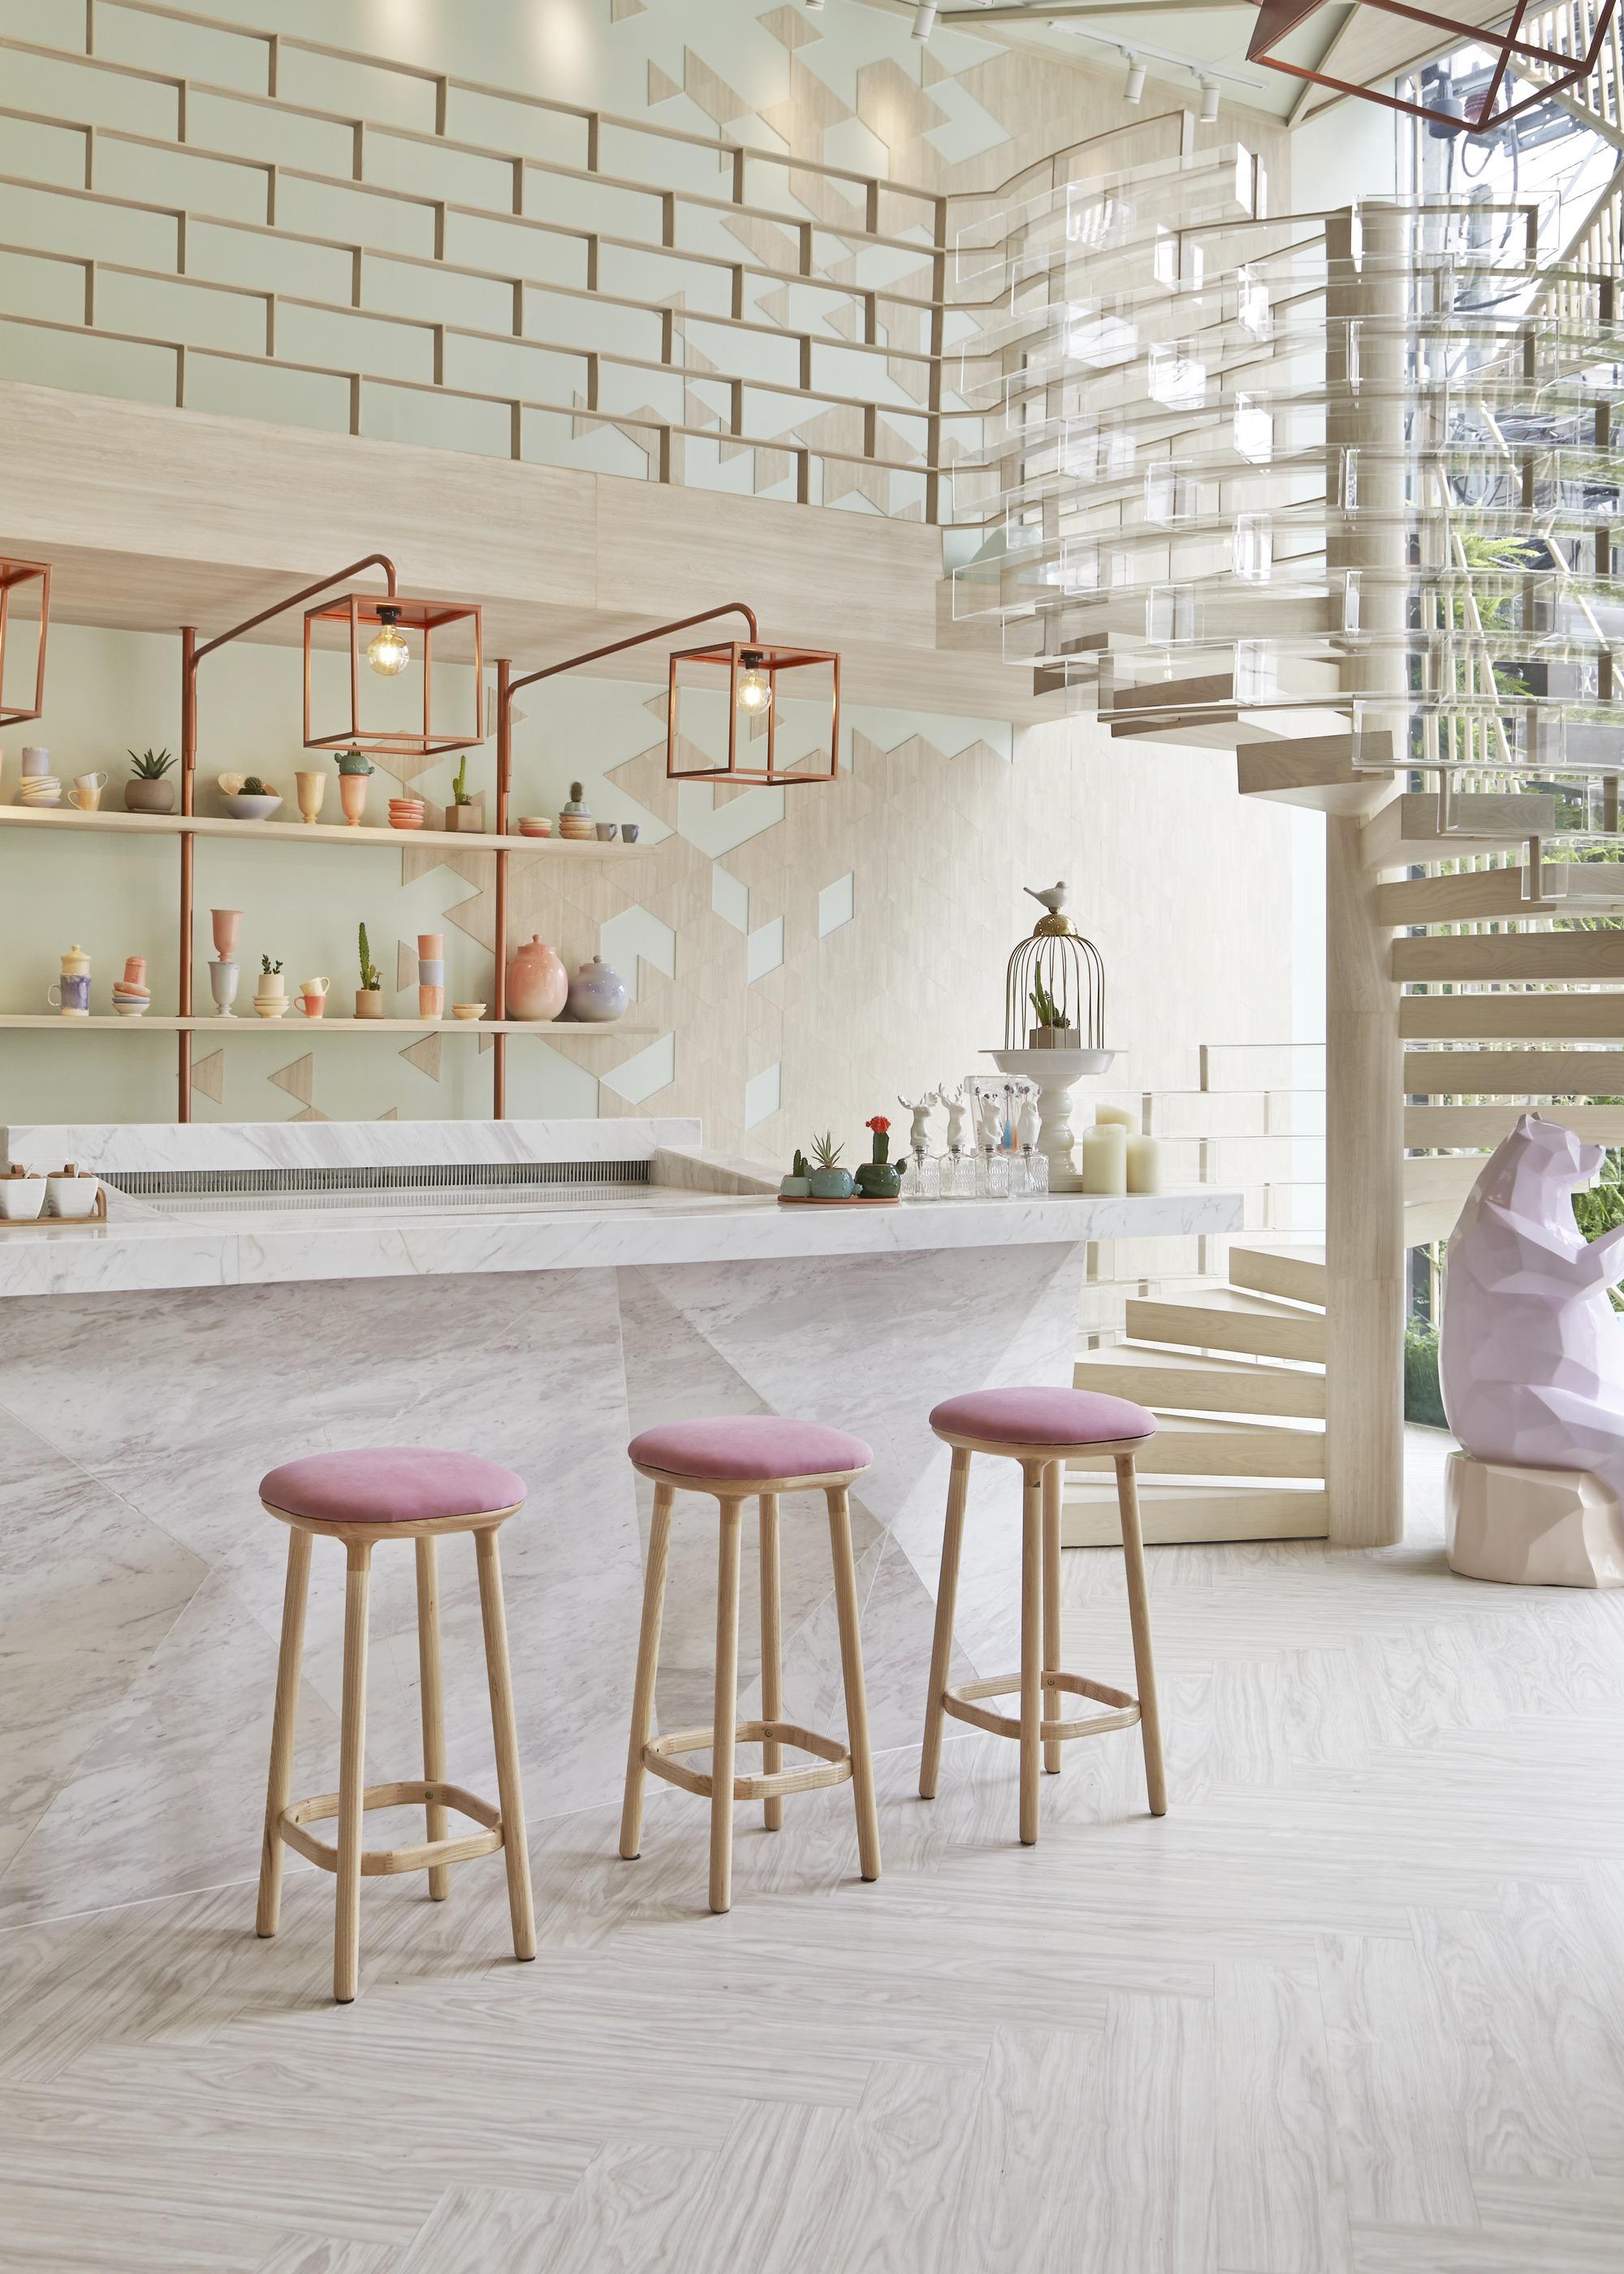 2016 Restaurant & Bar Design Awards Announced   ArchDaily